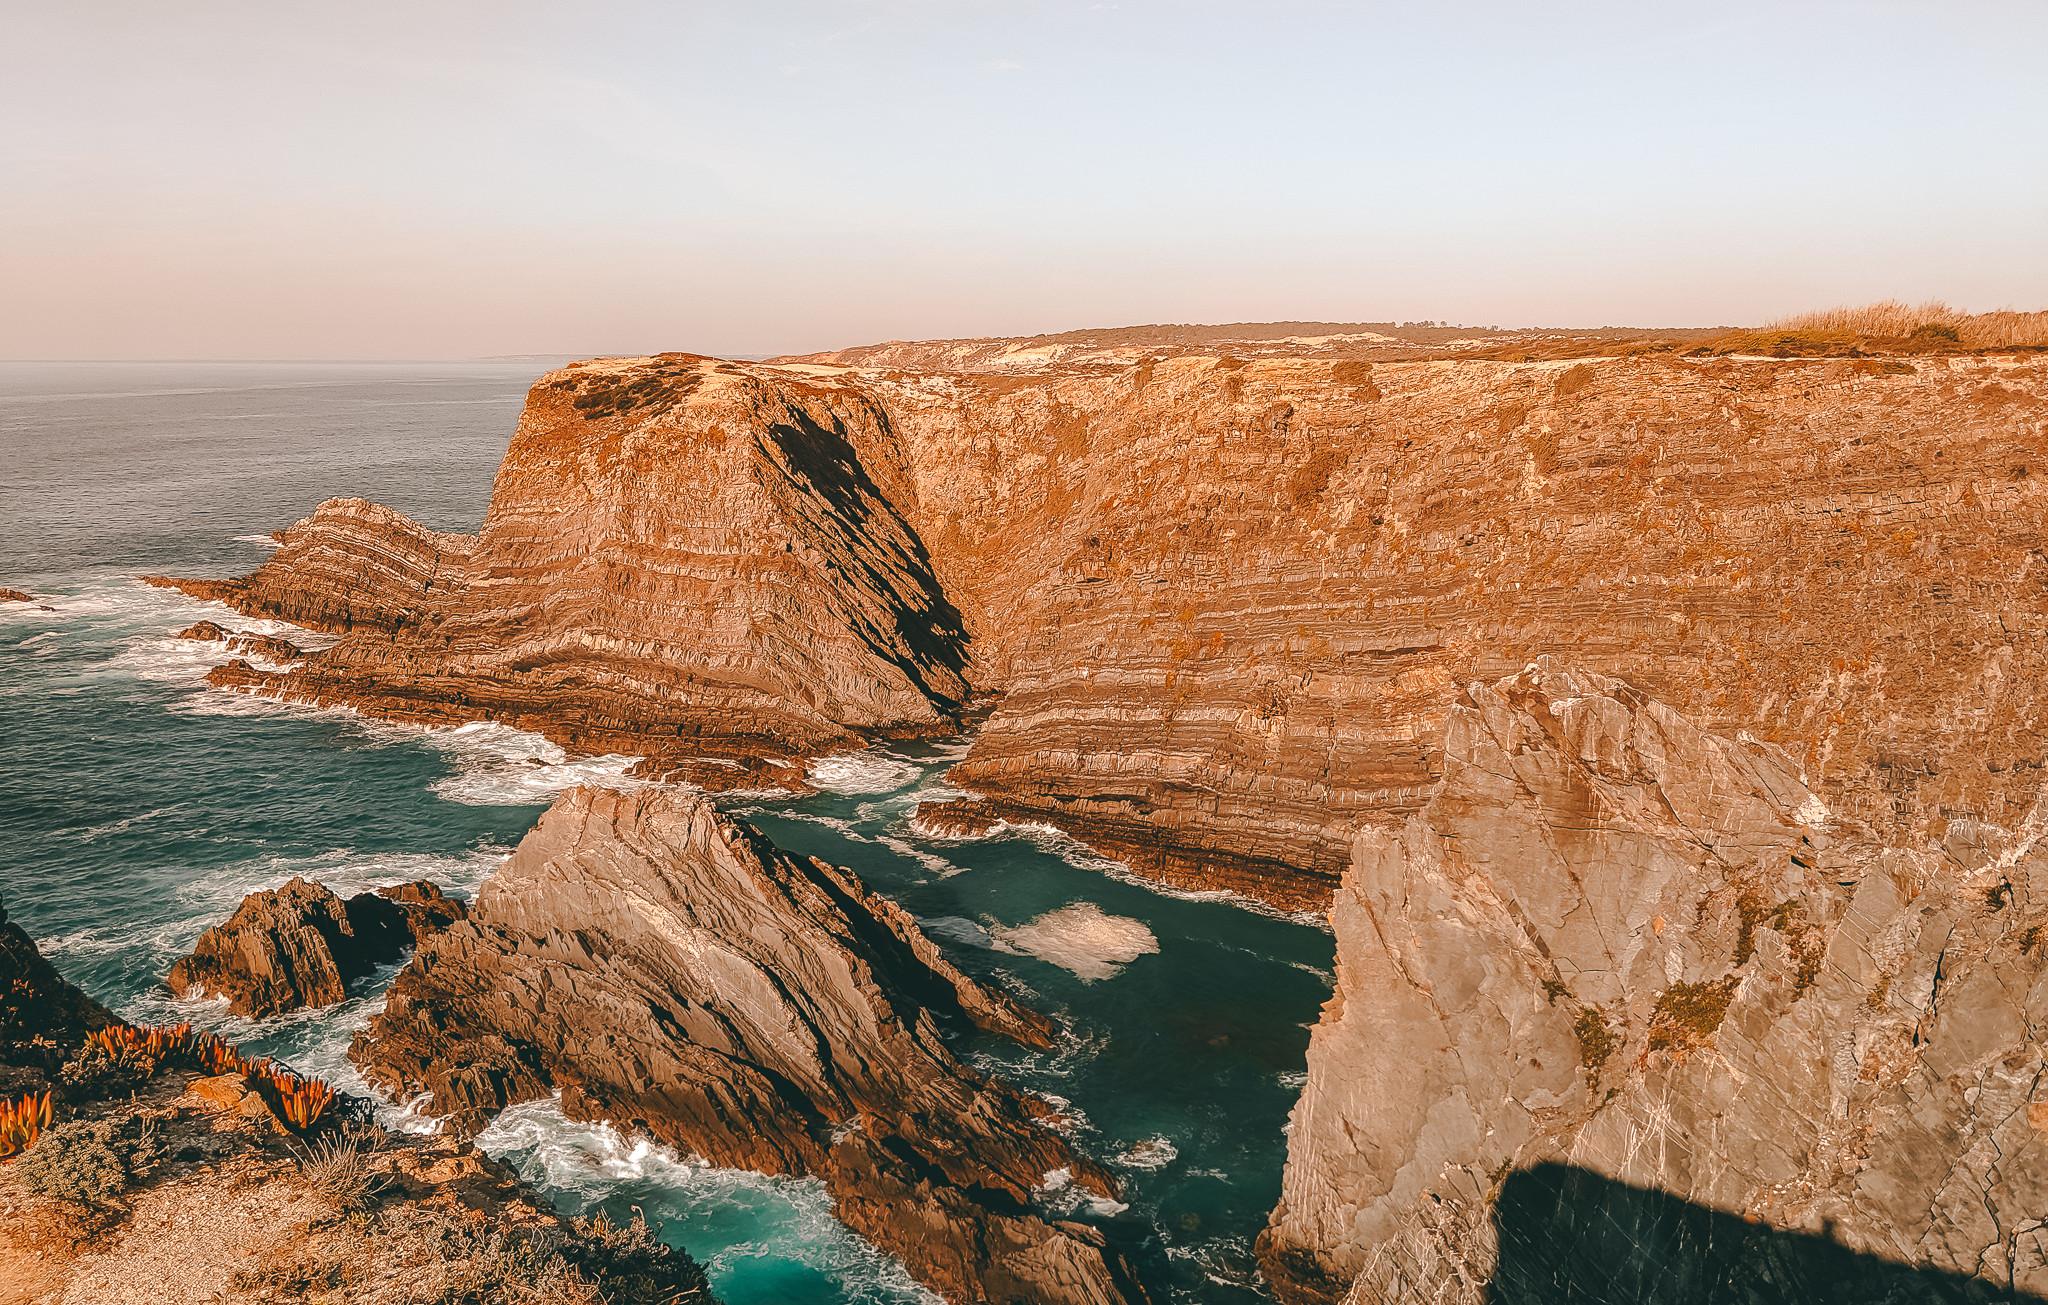 Algarve Coastline at Farol Cabo Sardão